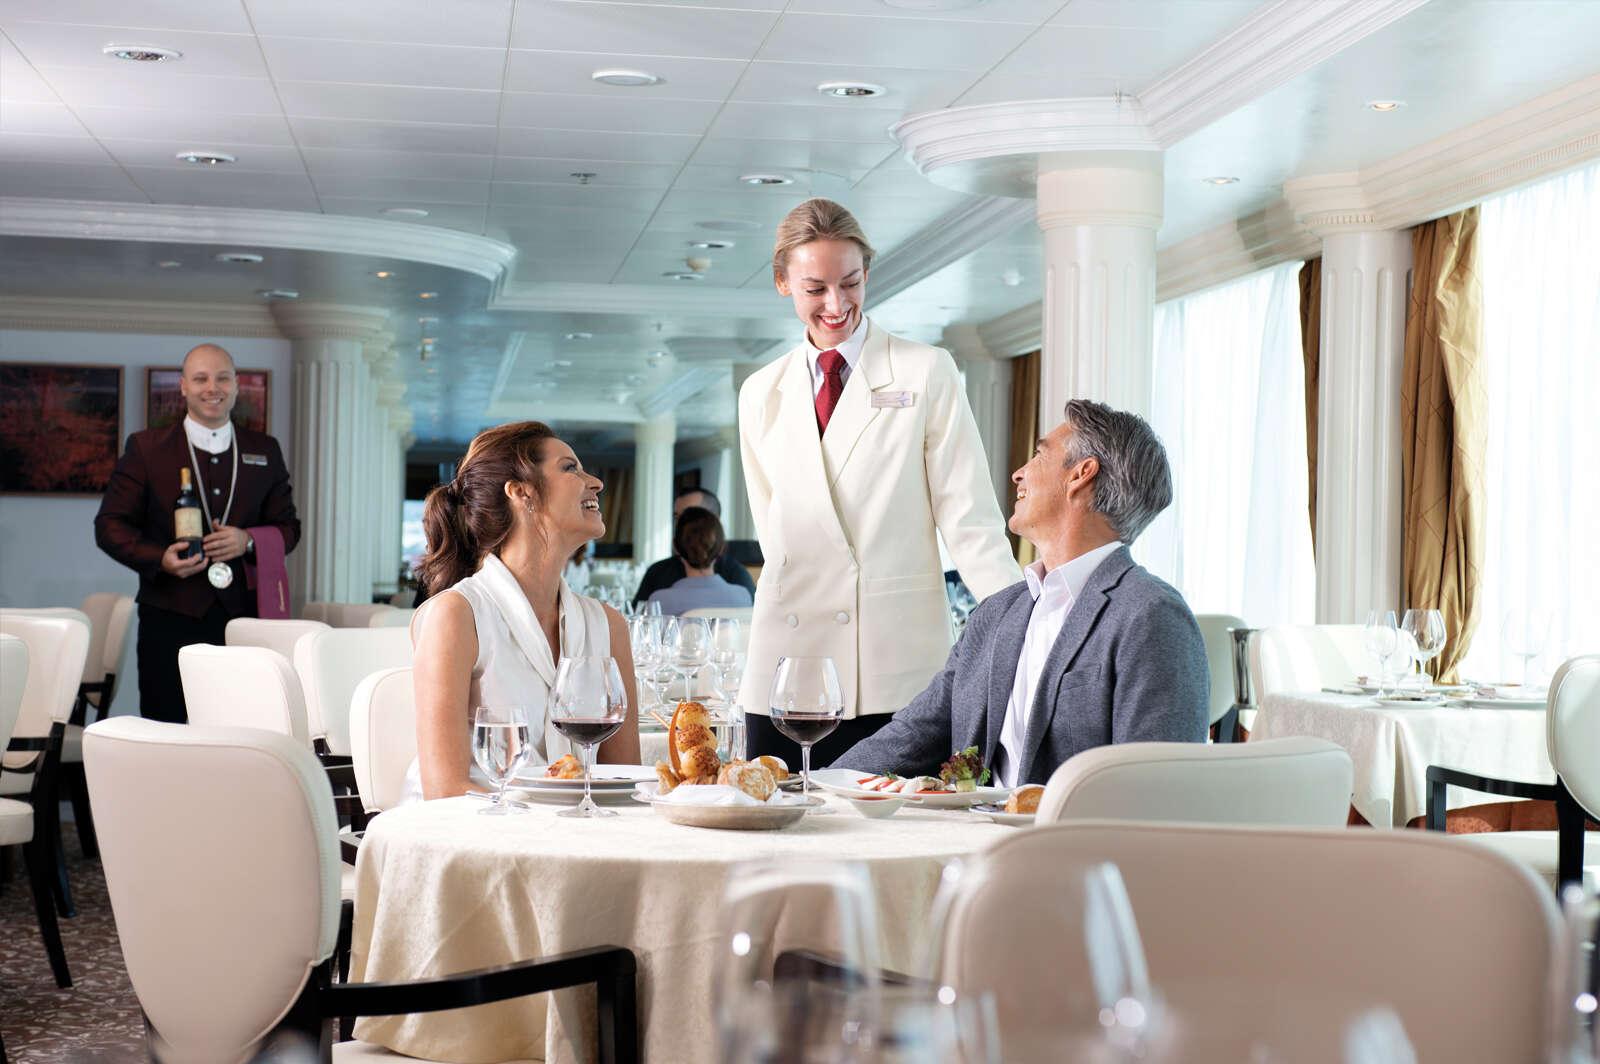 Oceania Cruises - Free pre-paid gratuities!